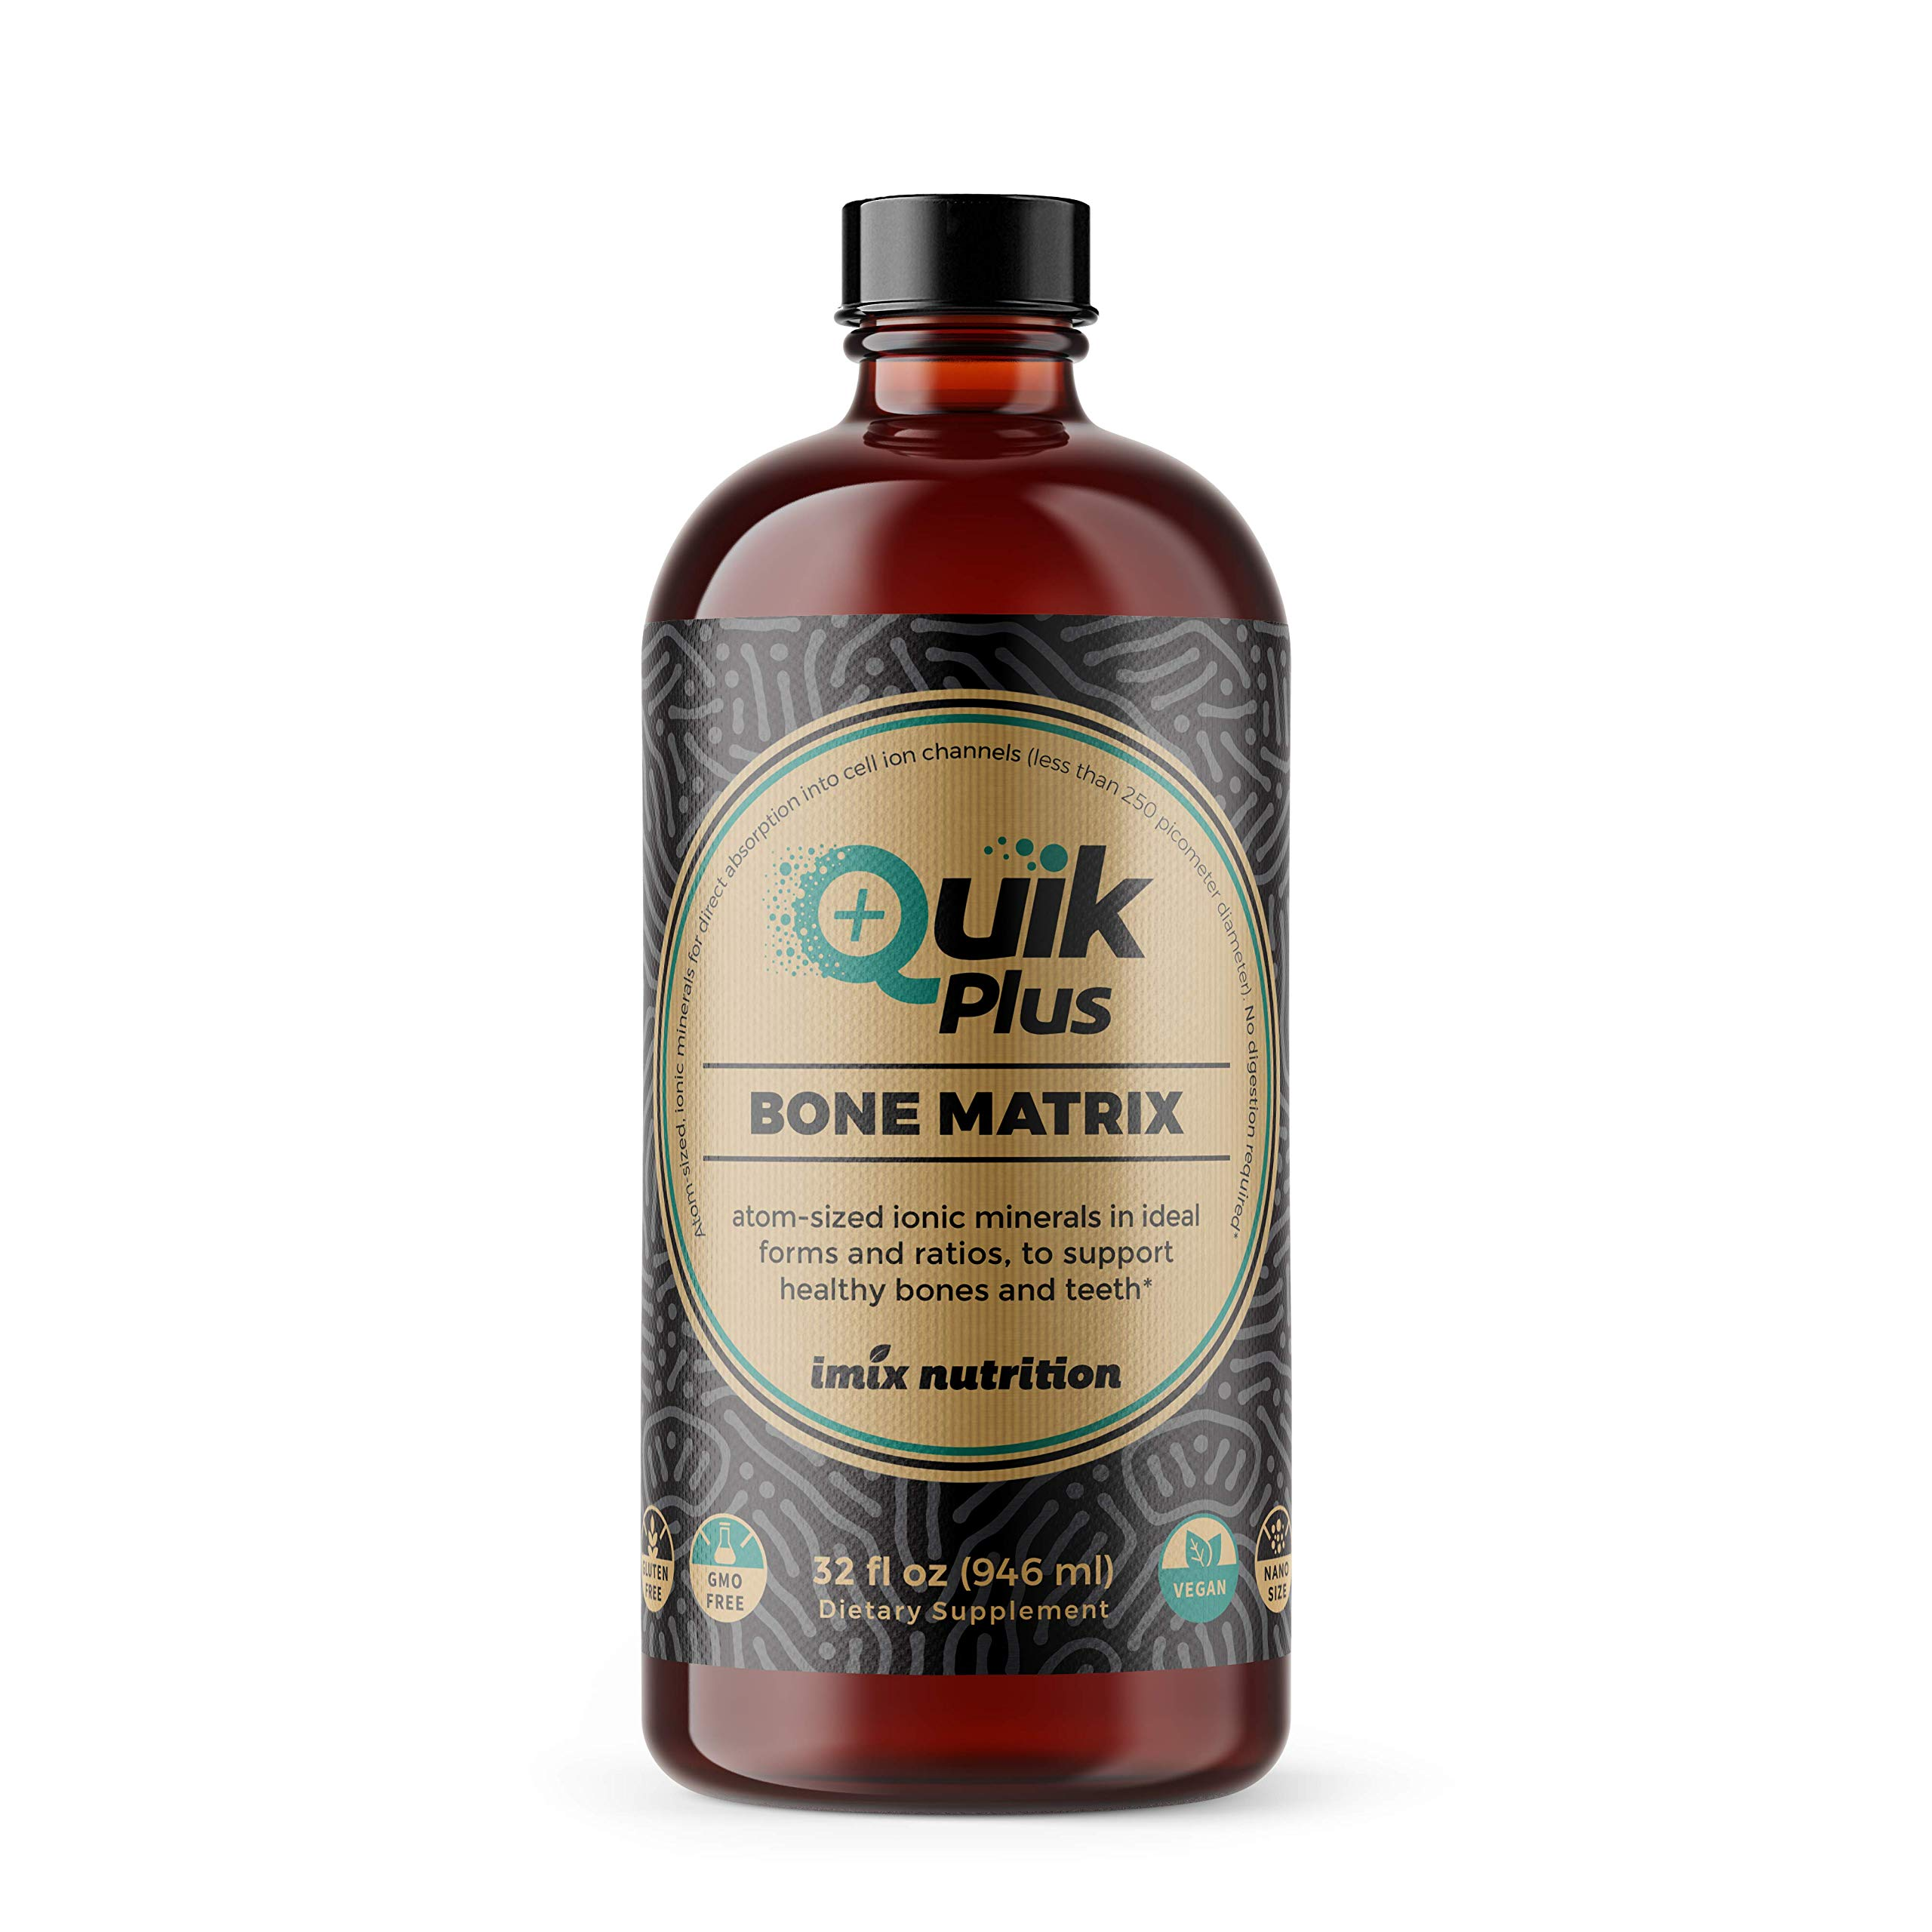 QuikPlus Bone Matrix with Calcium, Magnesium, Zinc, and Potassium - Includes 9 Ionic Liquid Minerals, Collagenizer for Bone and Teeth Support, Vegan, Gluten-Free, All Natural, 32 Ounce Bottle